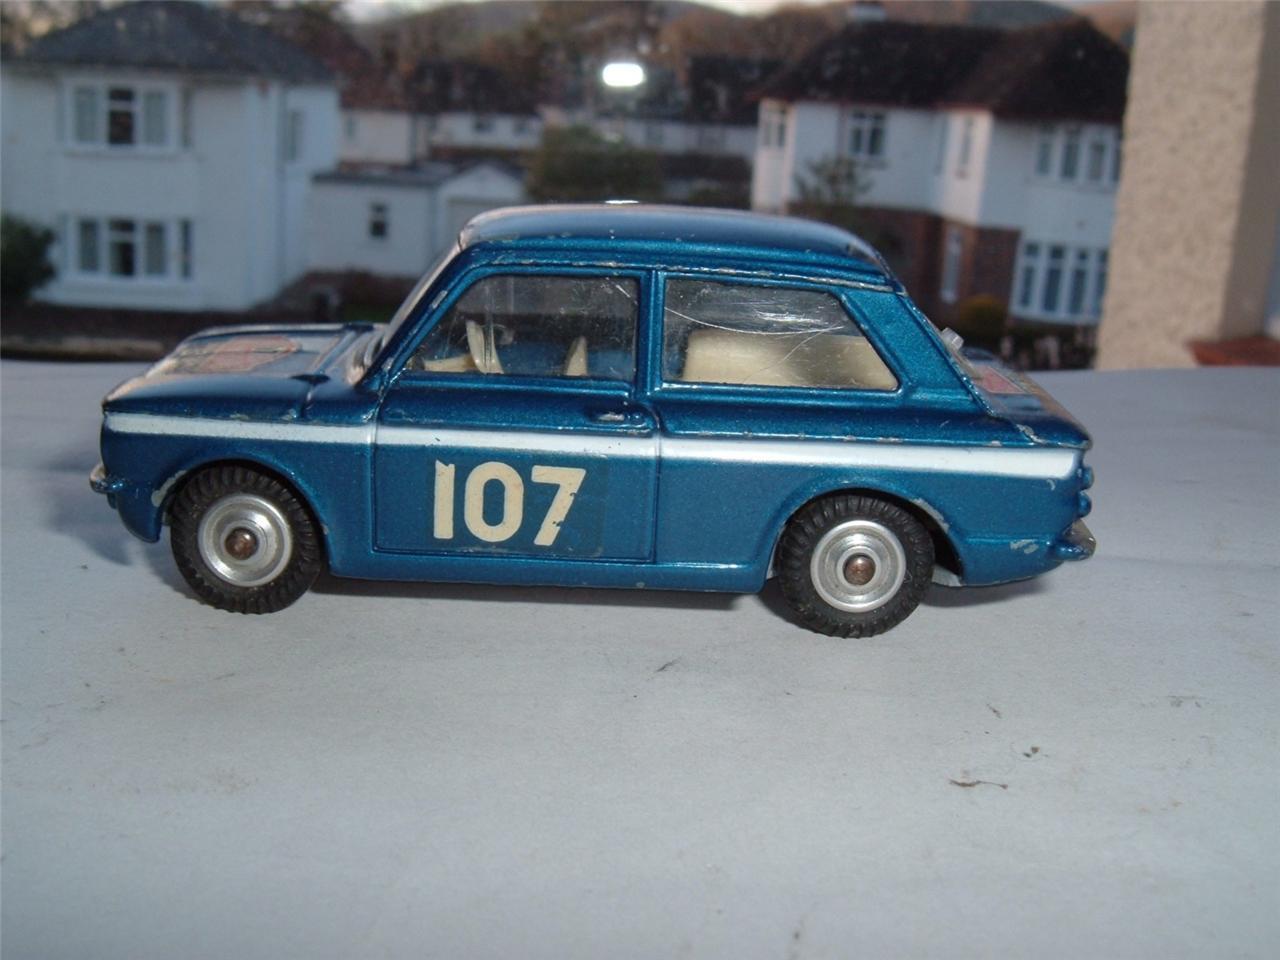 CORGI jouet 328 1966 MONTE CARLO Rallye HILLMAN IMP original nettoyer voir photos